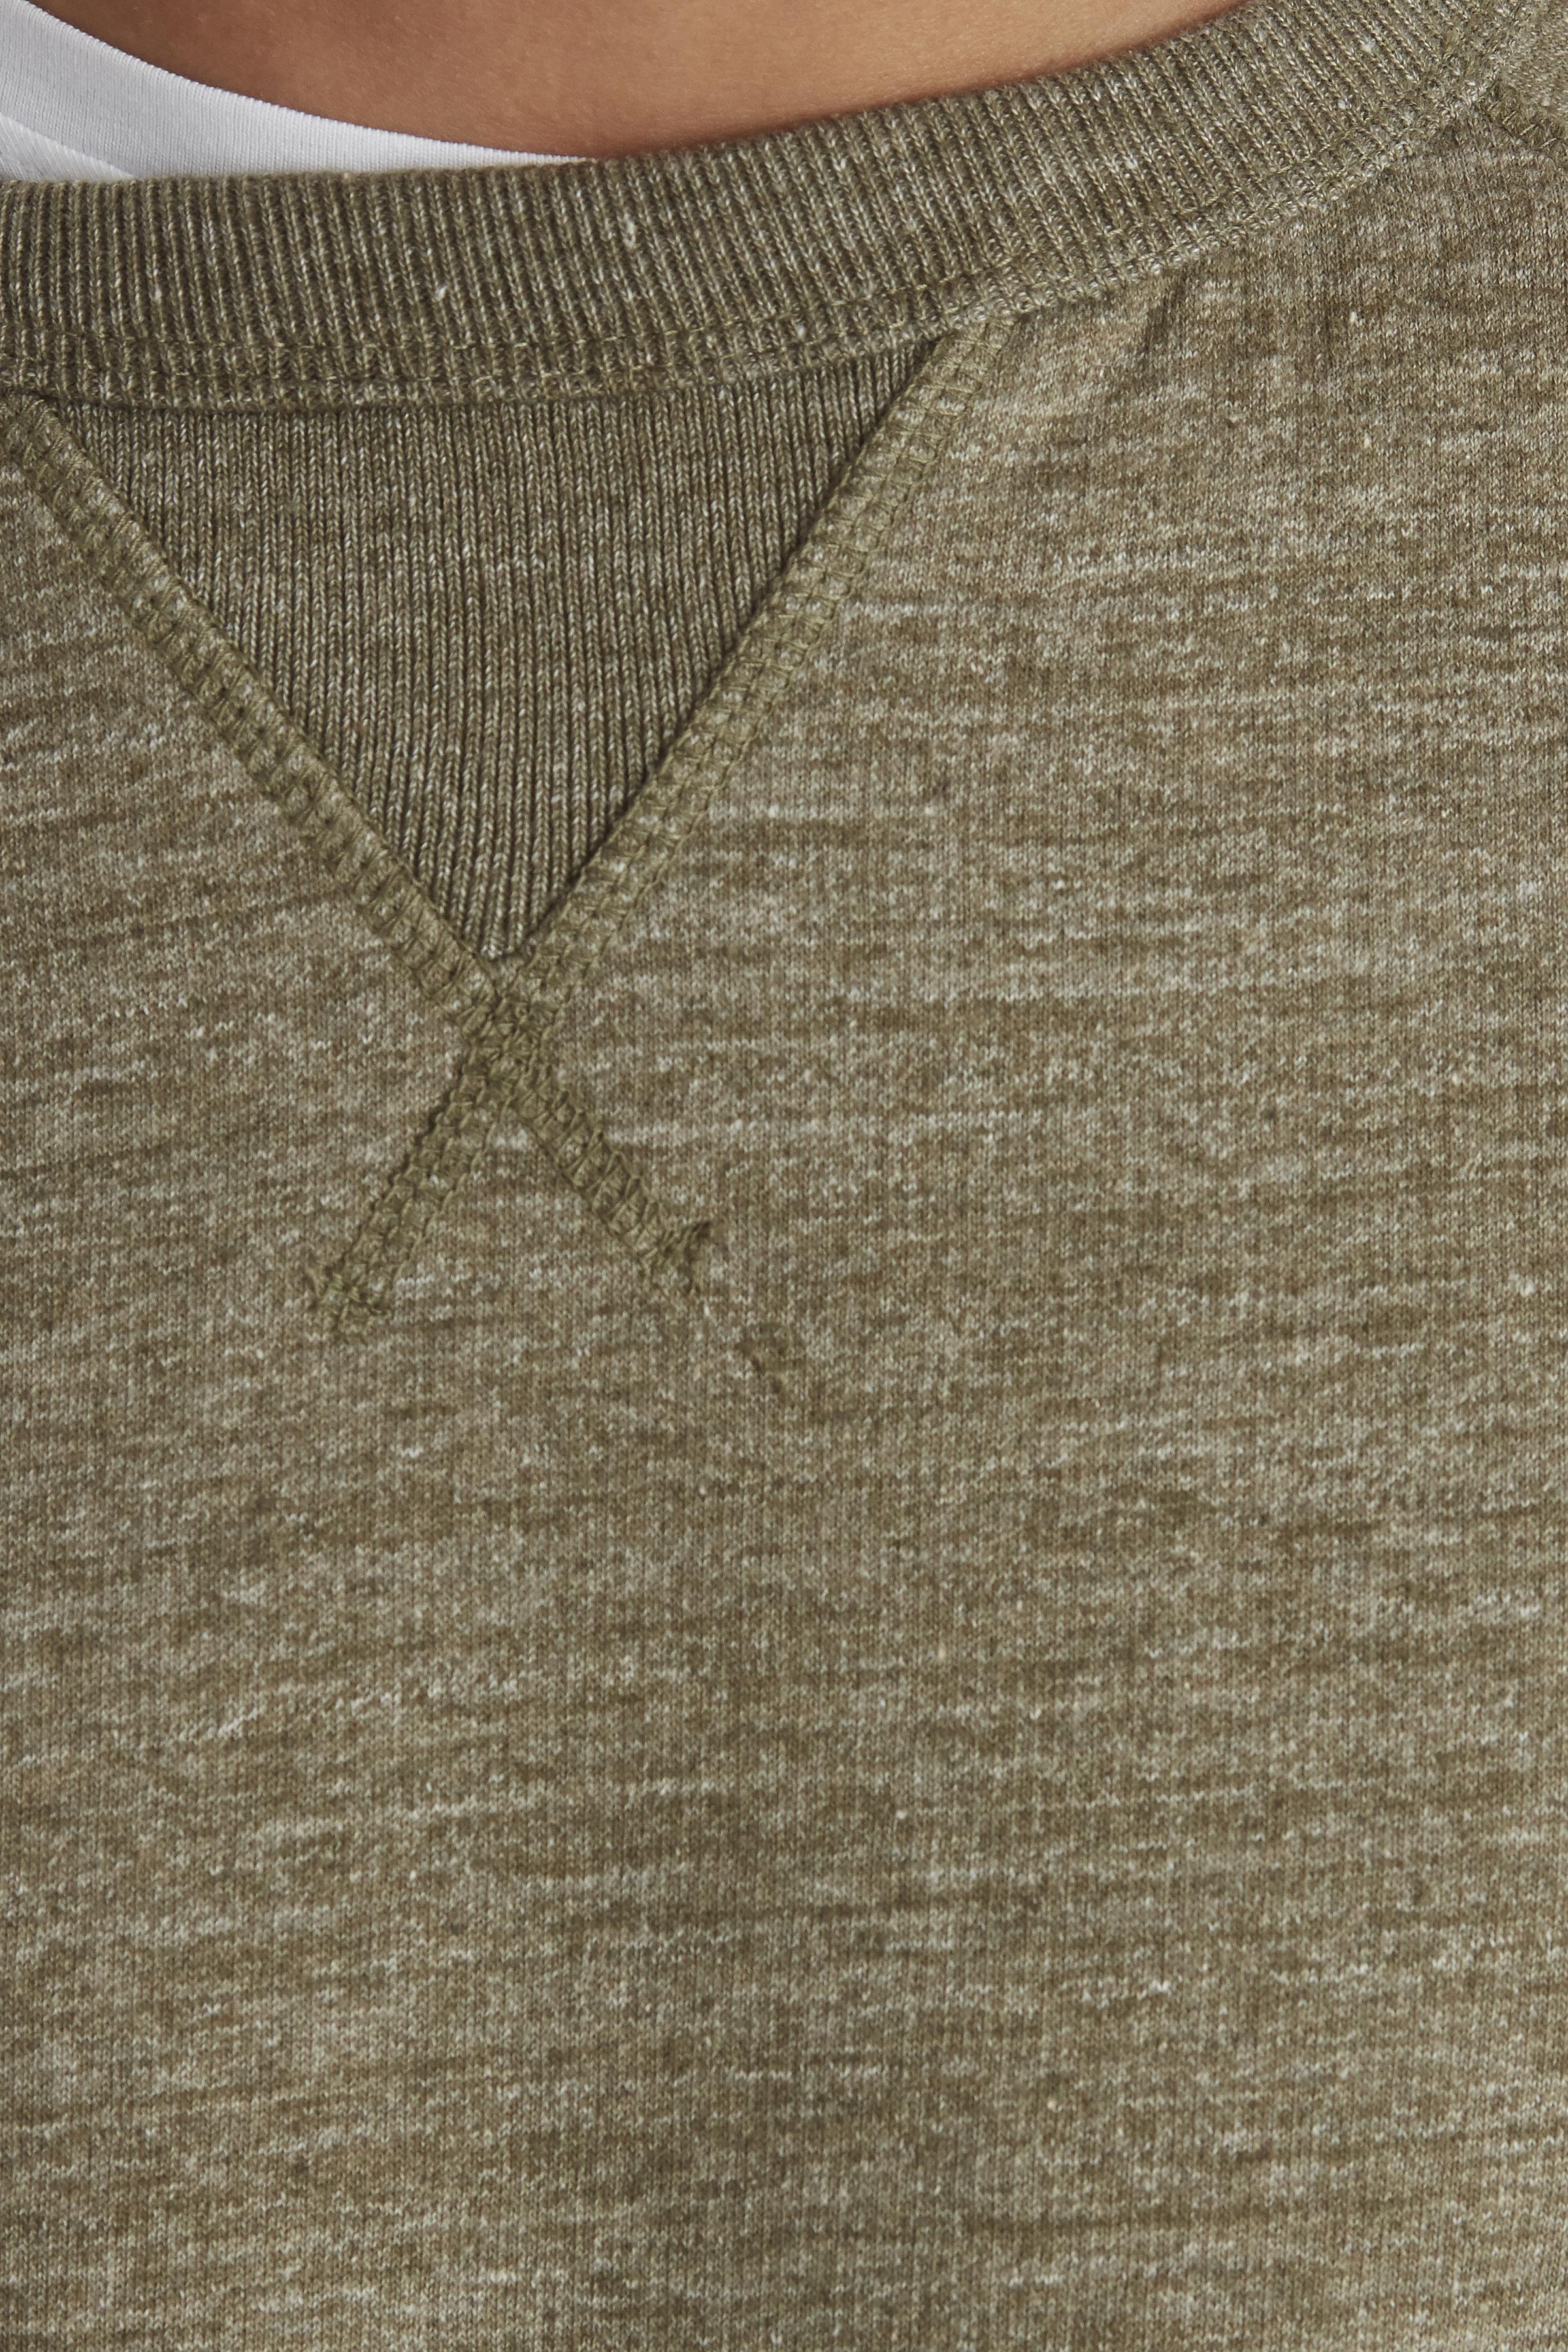 Forest Night Green Sweatshirt – Køb Forest Night Green Sweatshirt fra str. S-3XL her